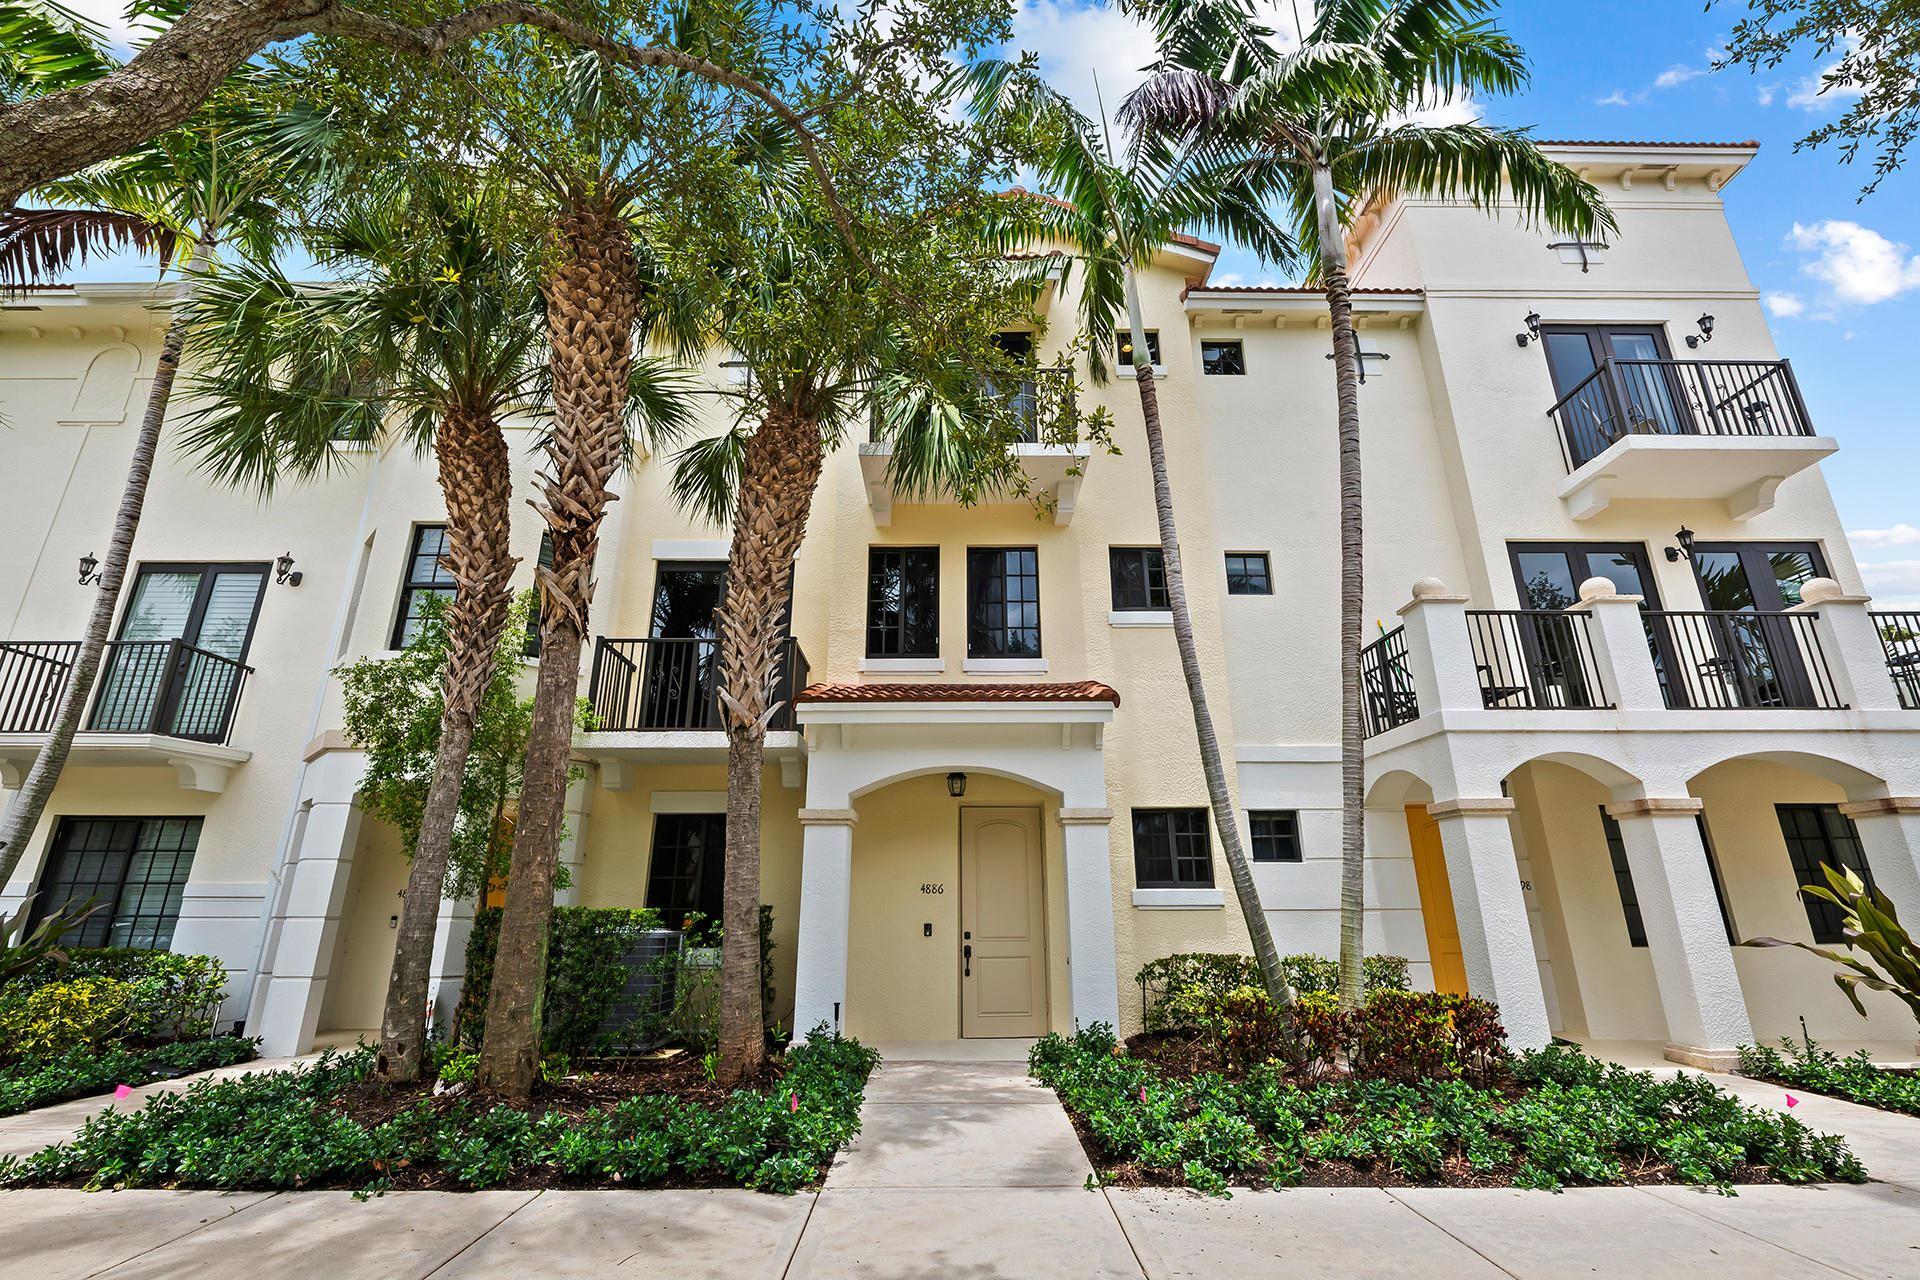 Photo of 4886 NW 16th Avenue, Boca Raton, FL 33431 (MLS # RX-10726418)